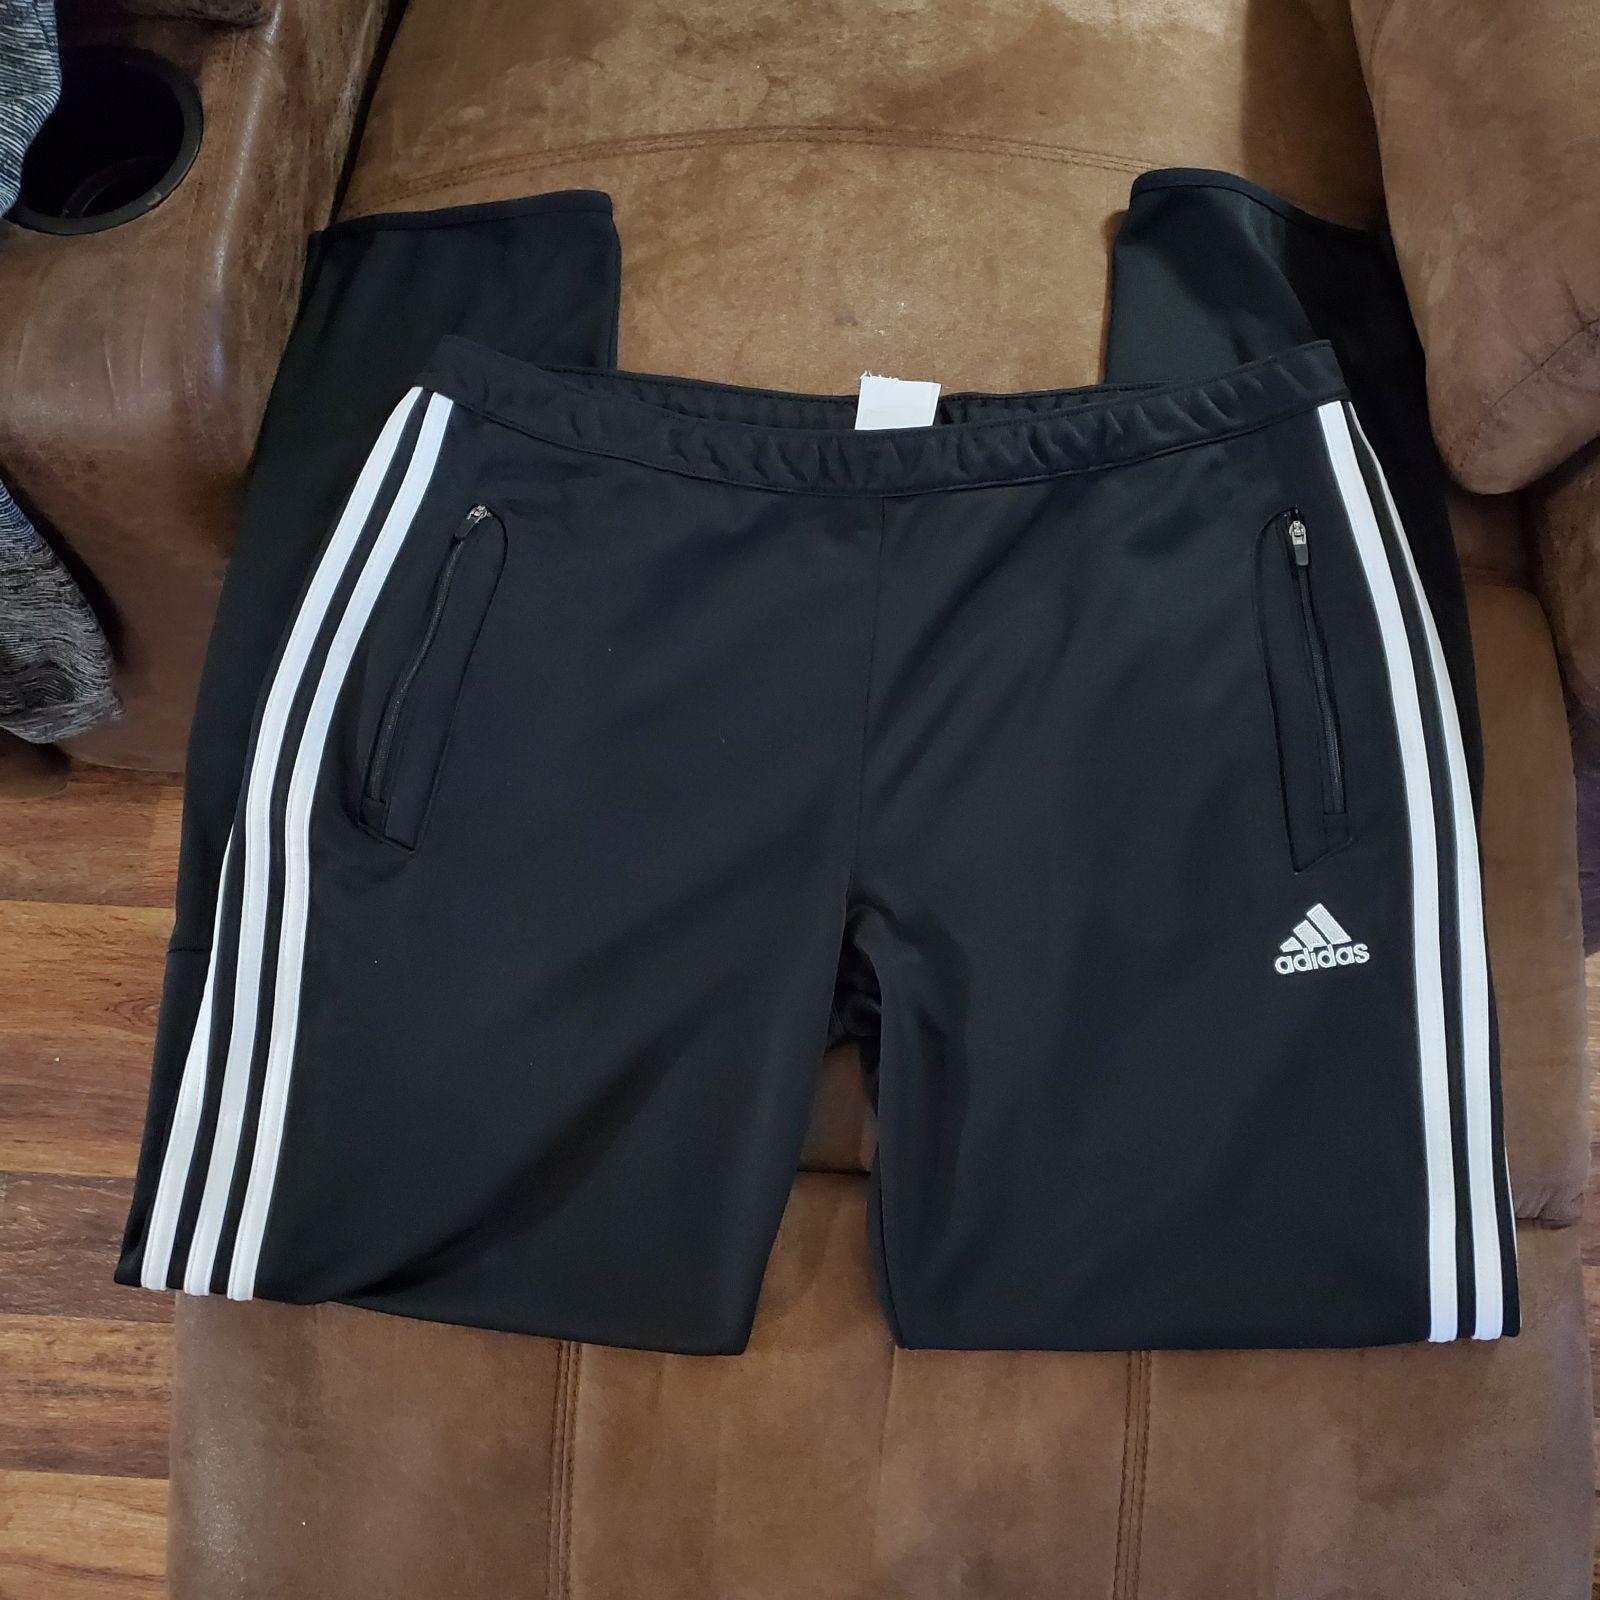 Adidas Climacool Athletic Pants size xl